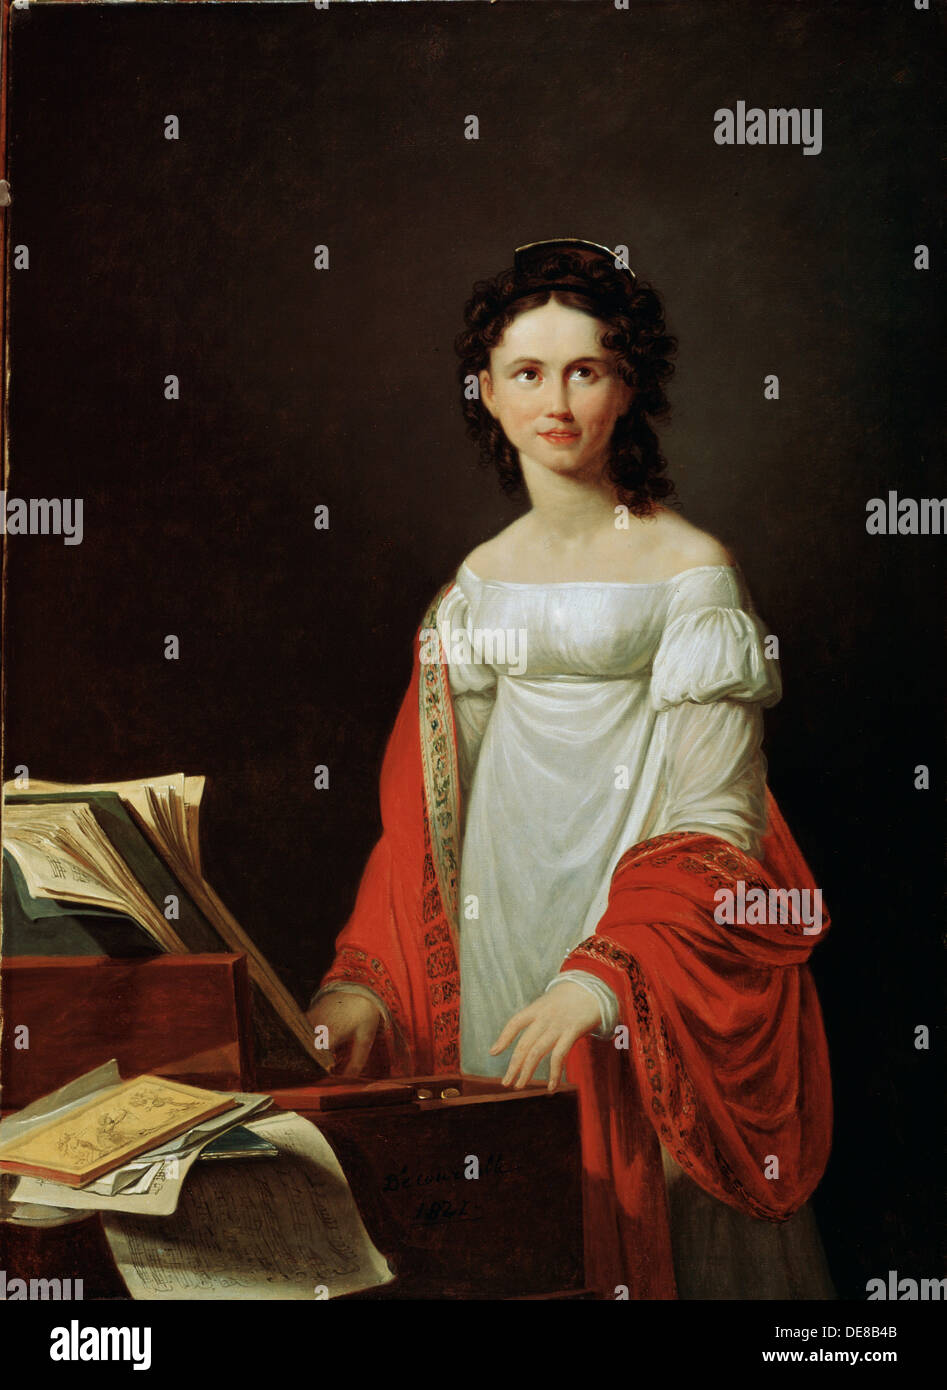 'Portrait of the Singer Anna Borunova', 1821.  Artist: Nicolas de Courteille - Stock Image